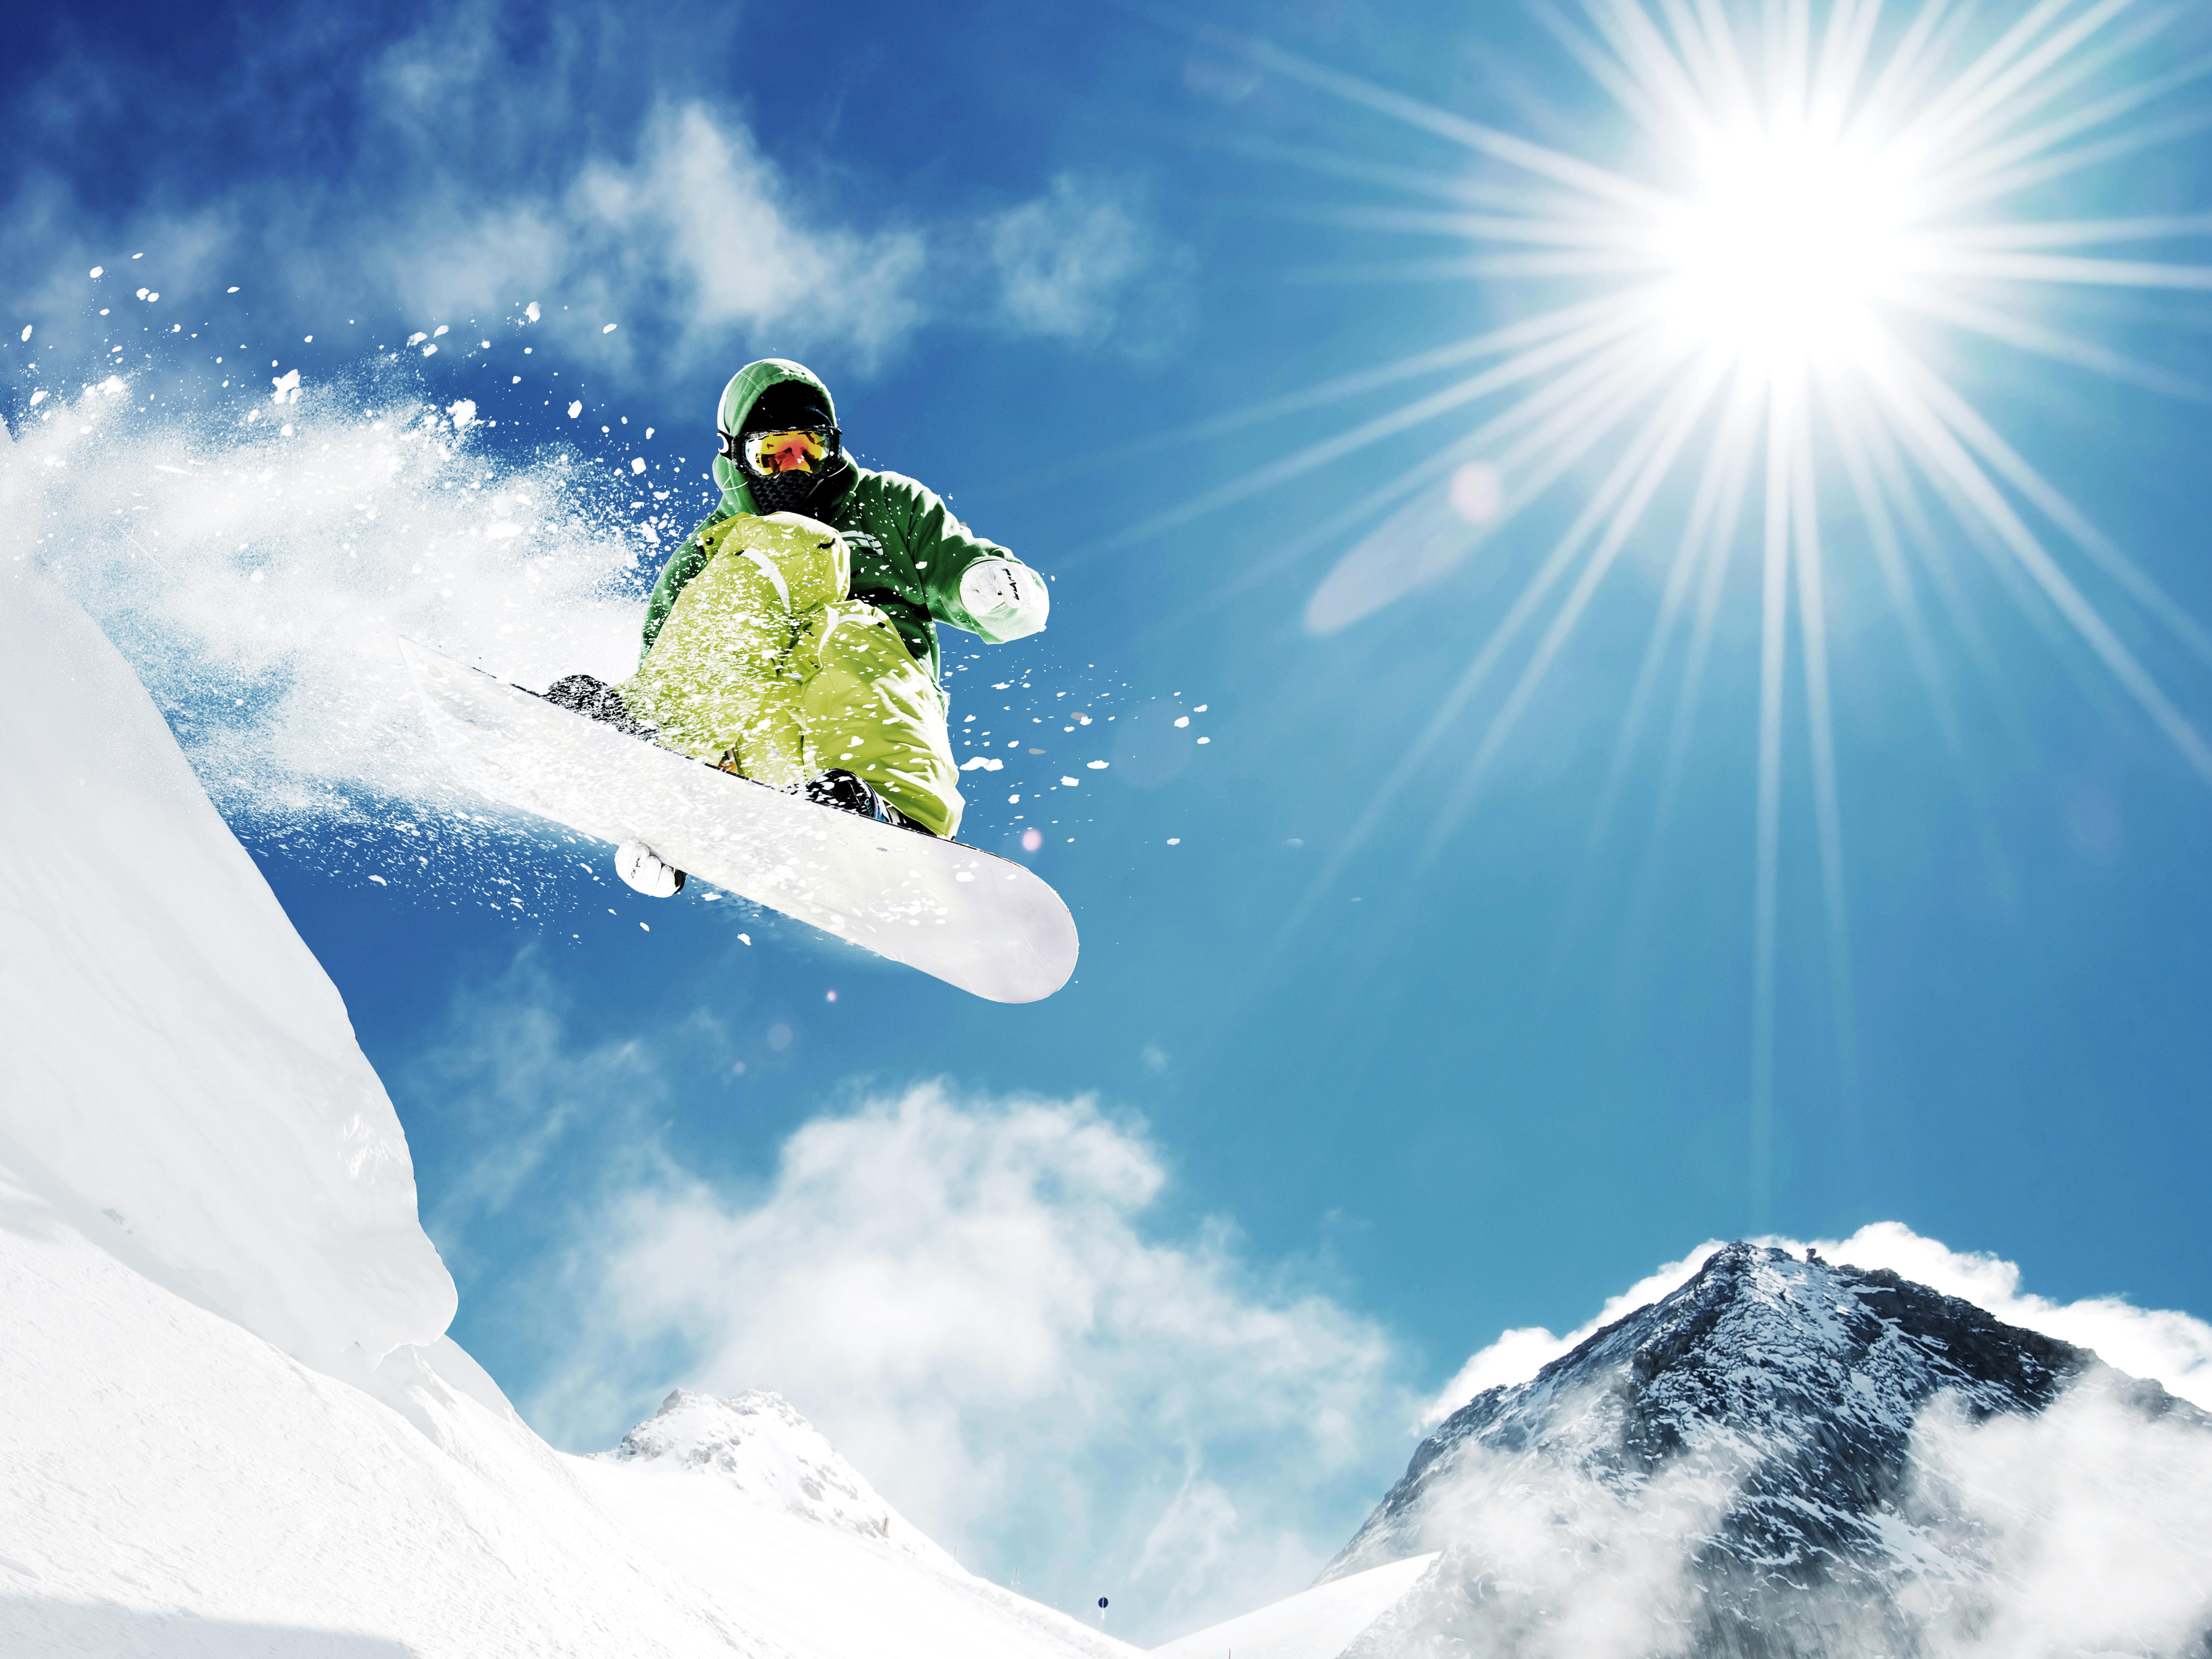 картинки про сноубордистов закрепились